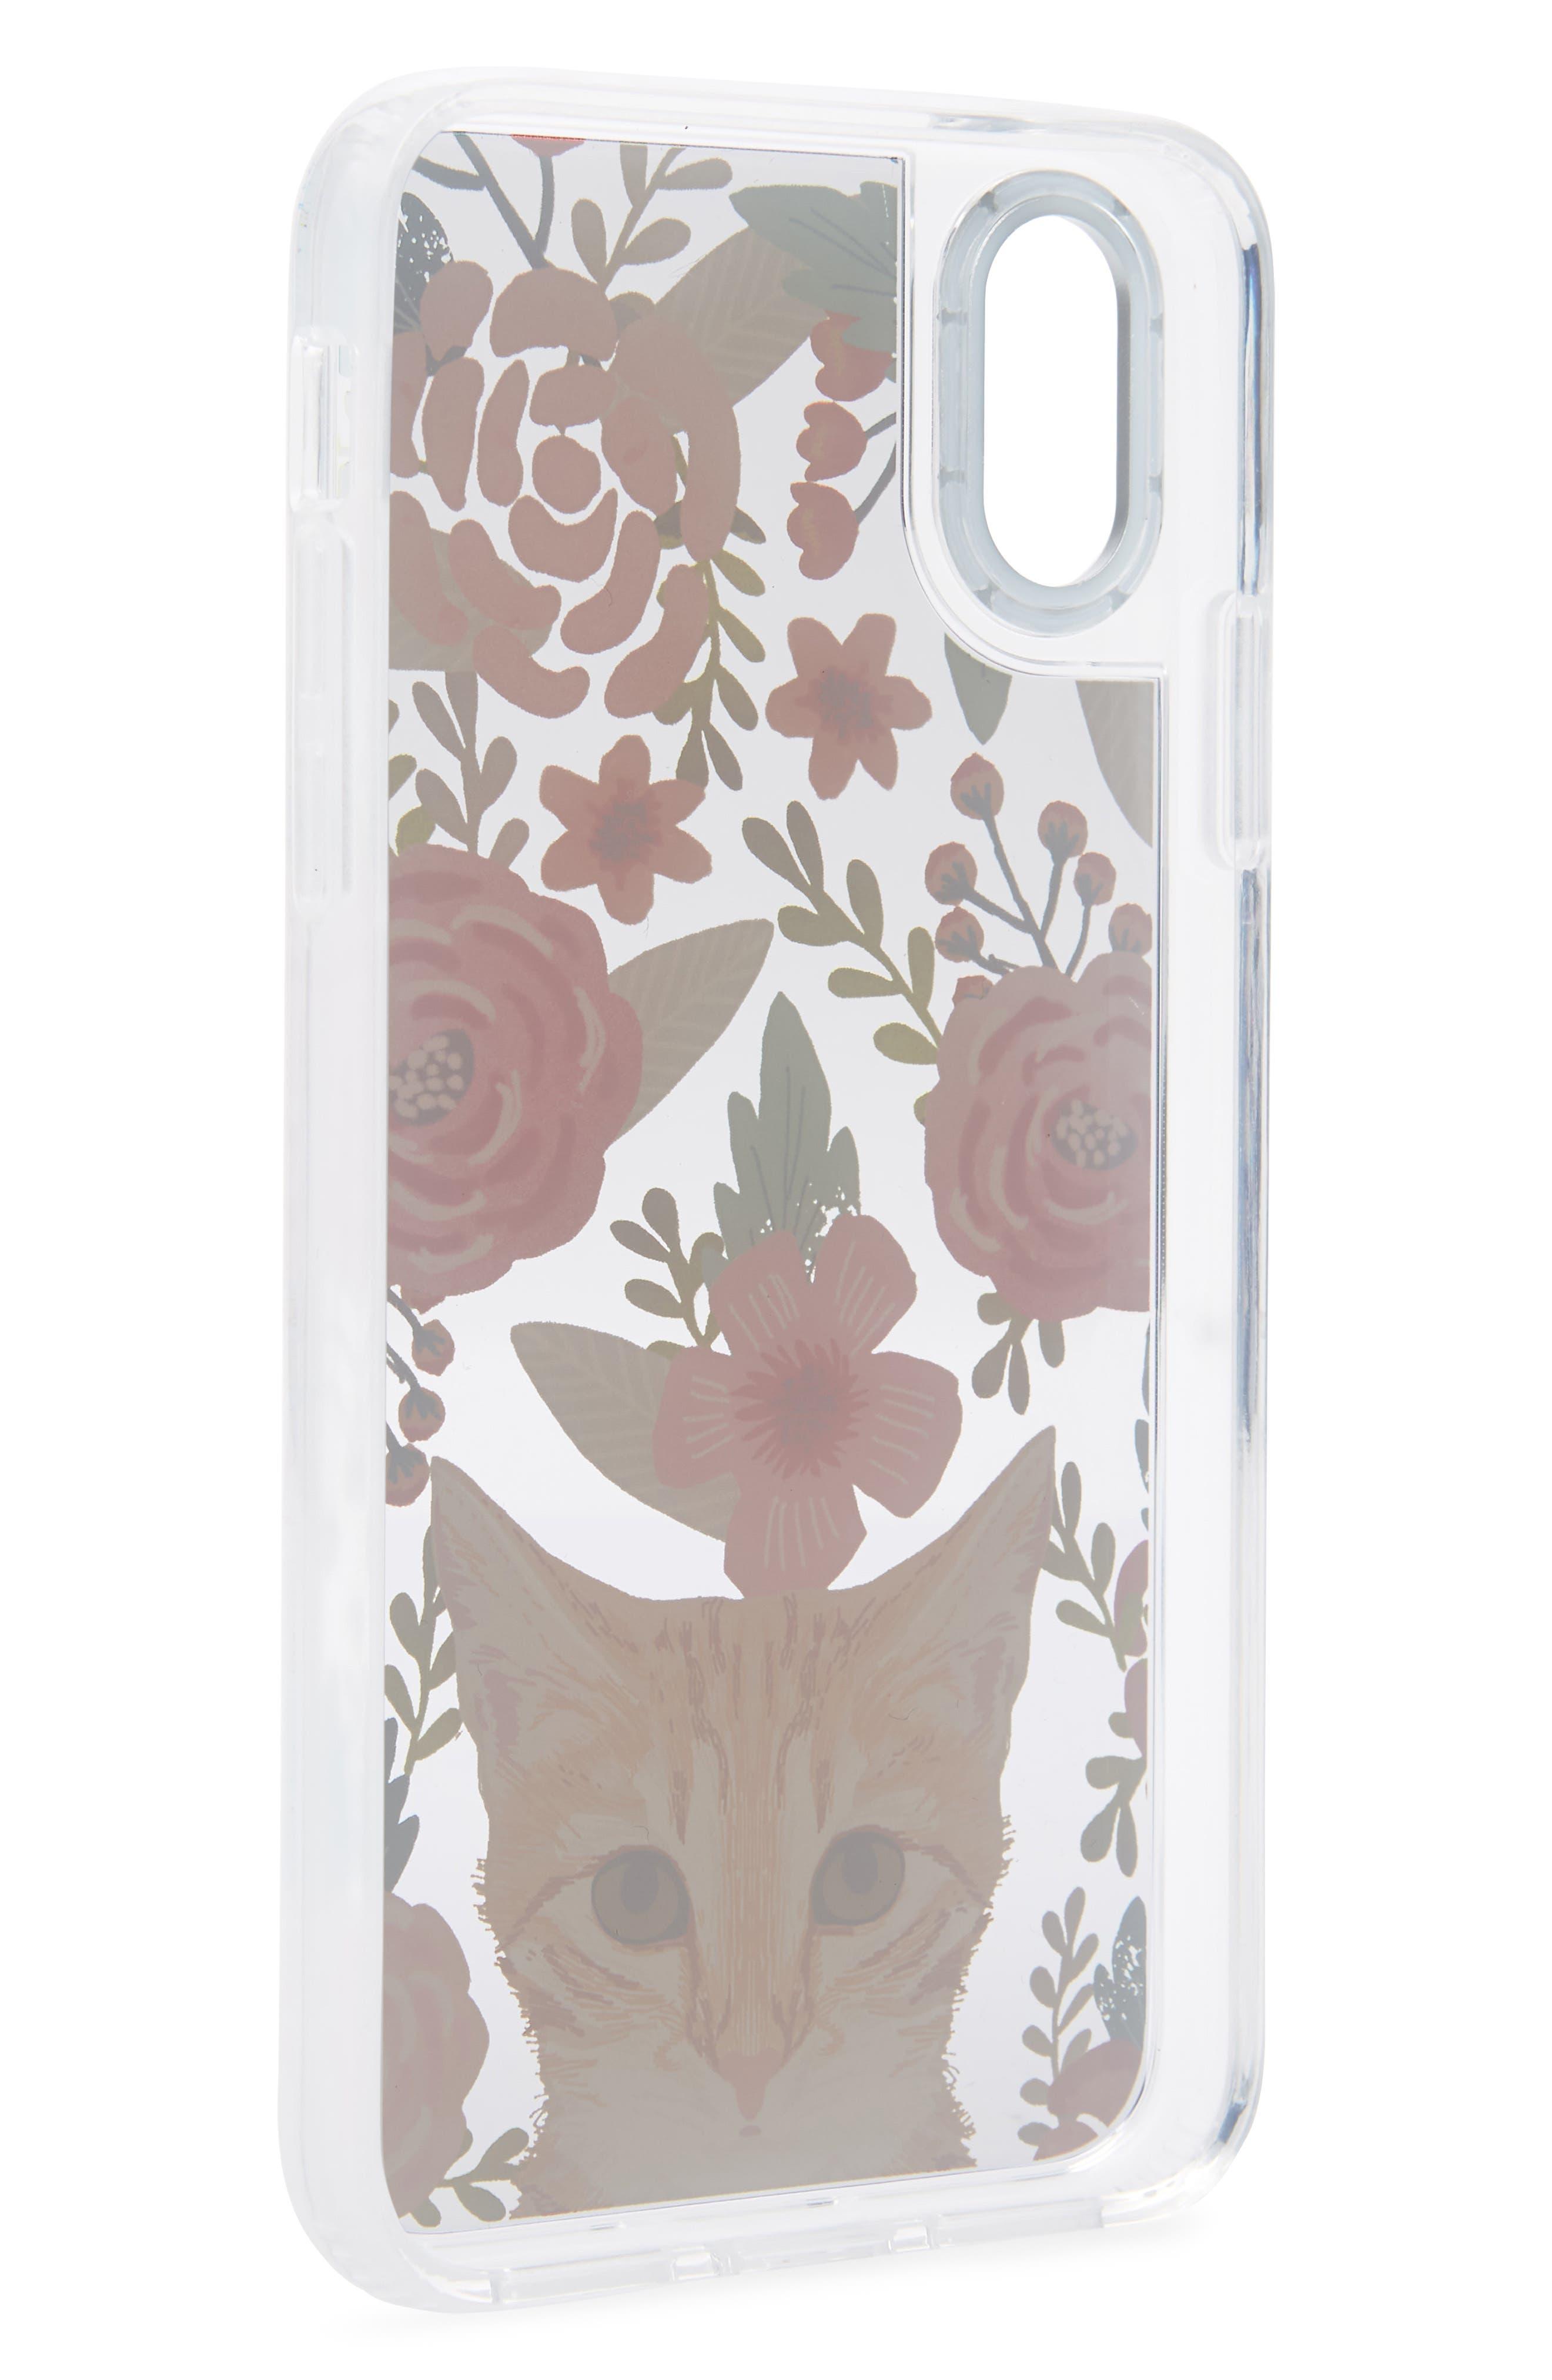 Cat Floral iPhone X/Xs, XR & X Max Case,                             Alternate thumbnail 2, color,                             MULTI ORANGE